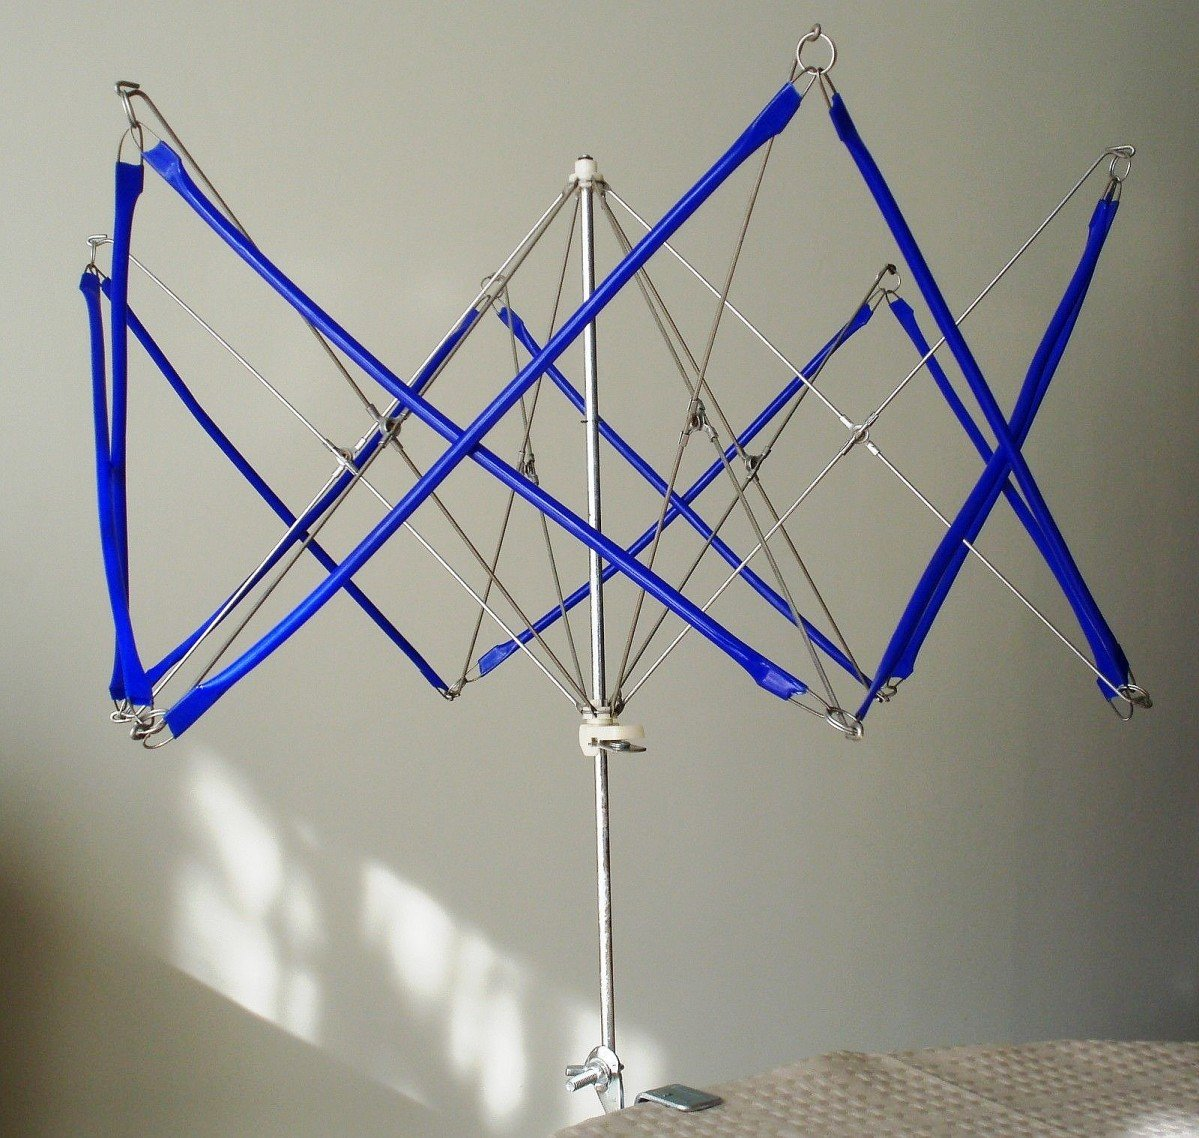 CHENGYIDA New Hand operated wool/yarn swift umbrella winder,Umbrella Swift Yarn Winder - Knitting Tool